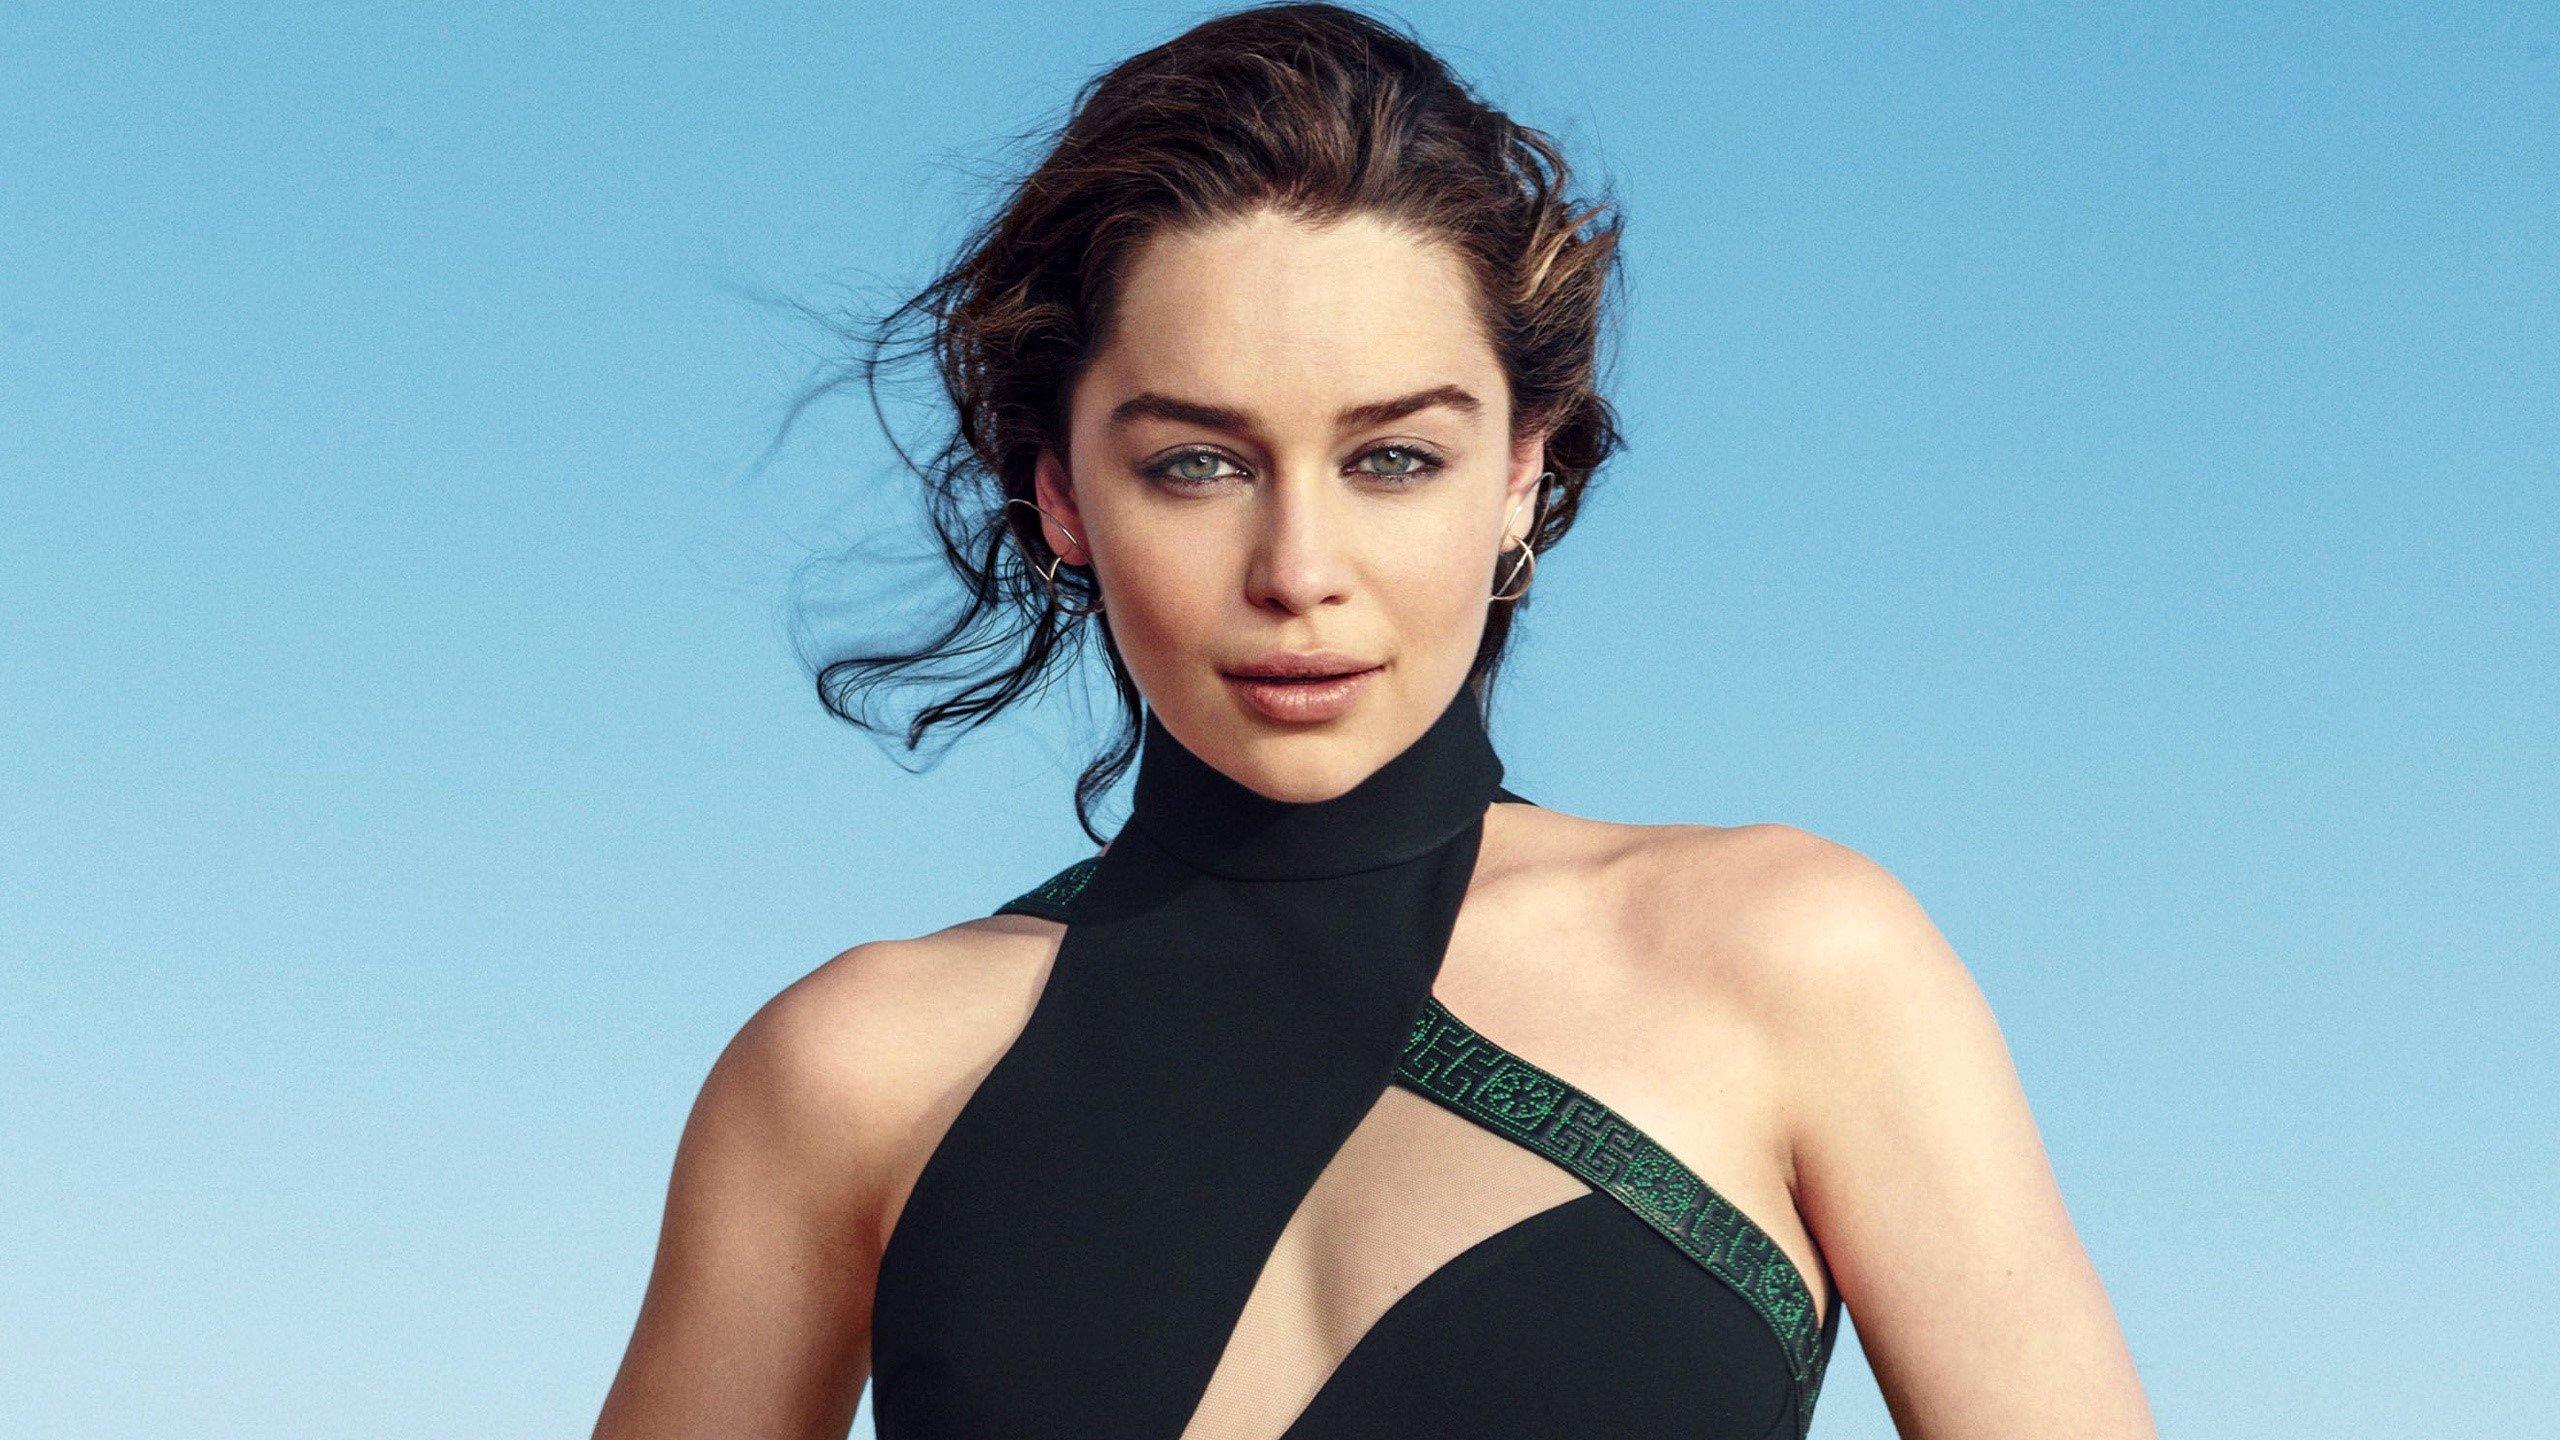 Fondos de pantalla Emilia Clarke morena